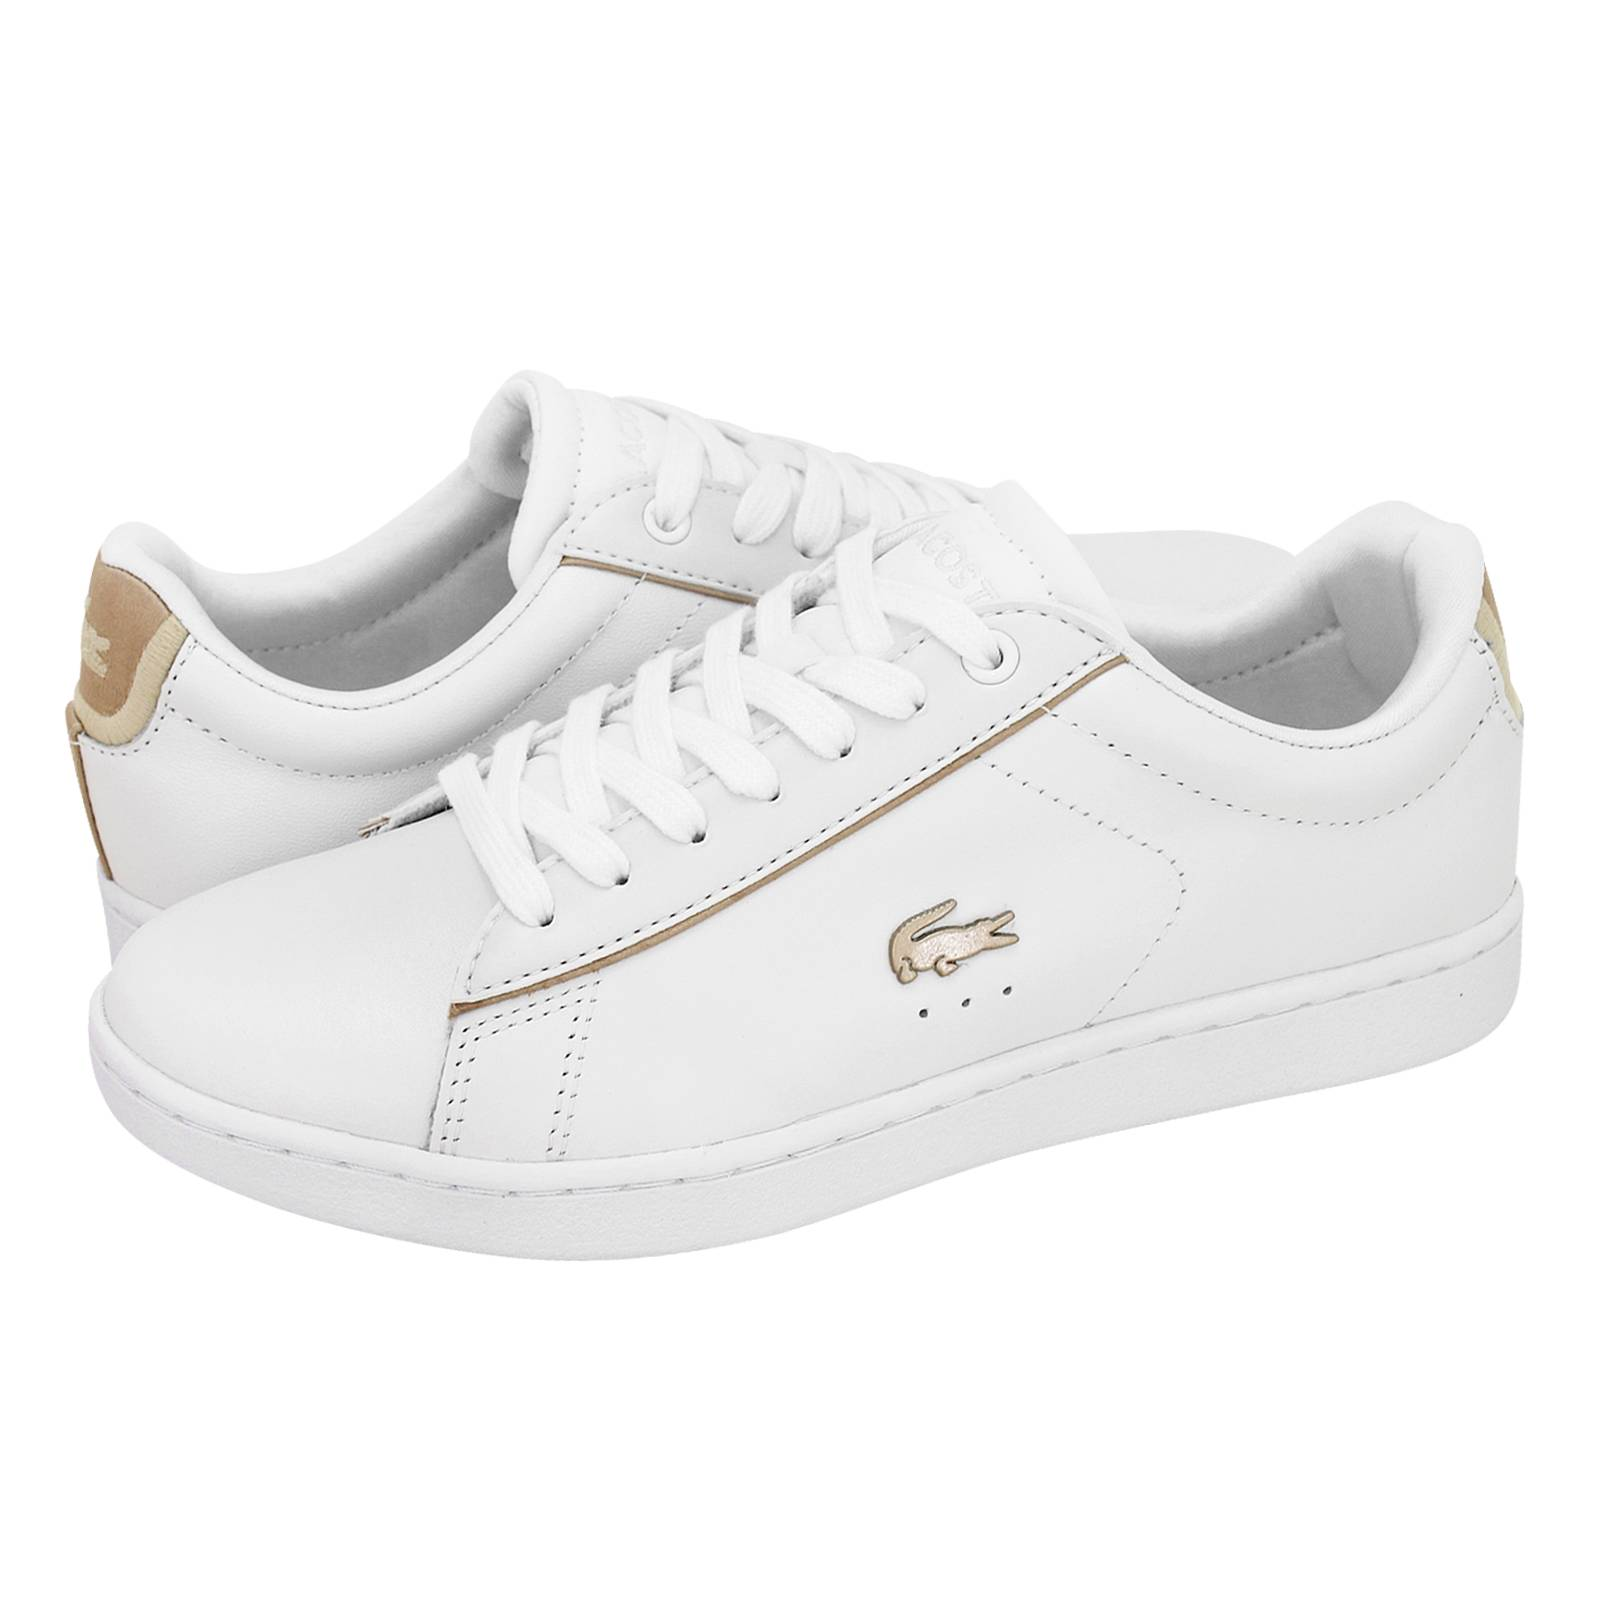 Carnaby Evo 118 6 - Γυναικεία παπούτσια casual Lacoste από δερμα και ... 3a149e692e4